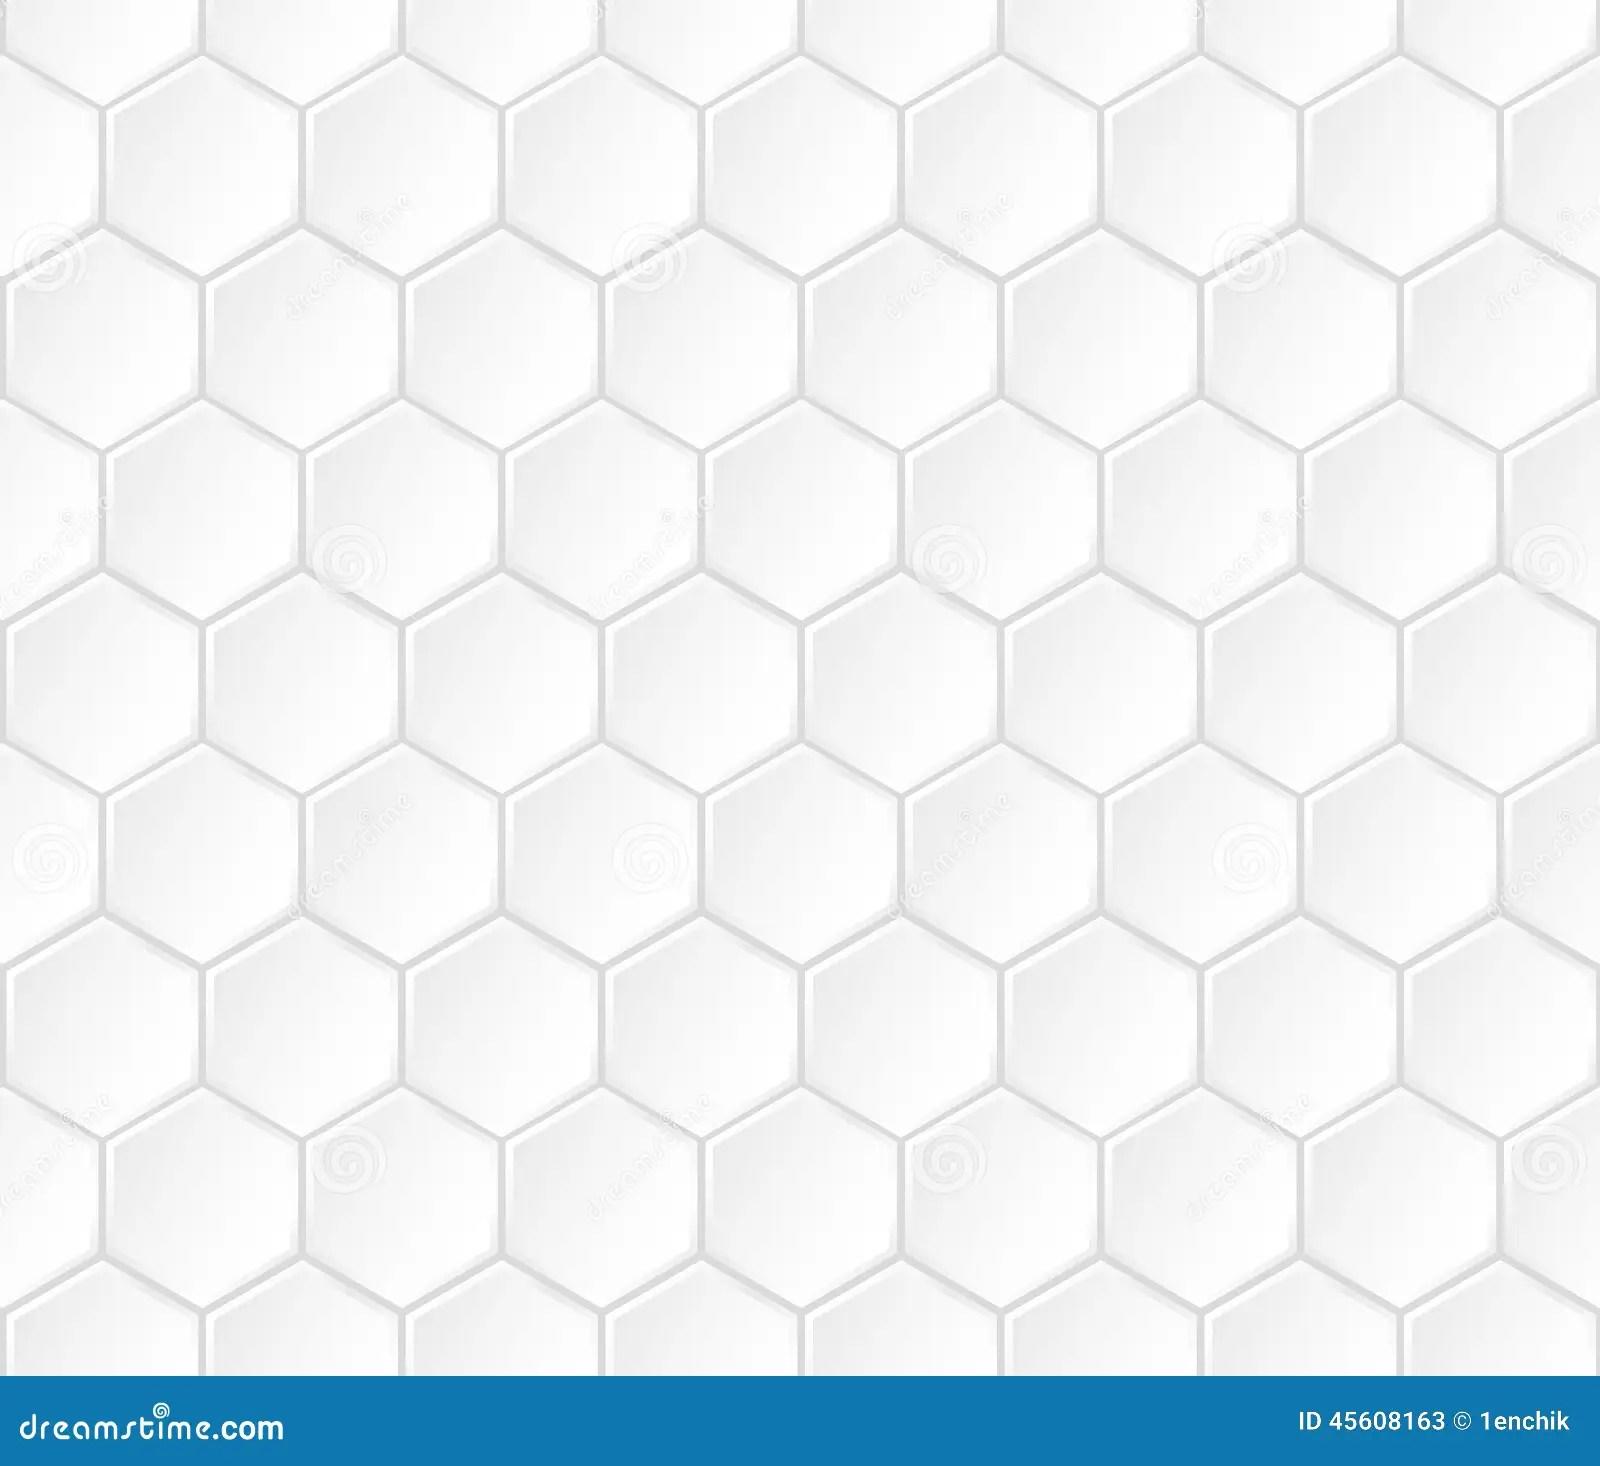 Geometric White Hexagonal Vector Seamless Pattern Stock